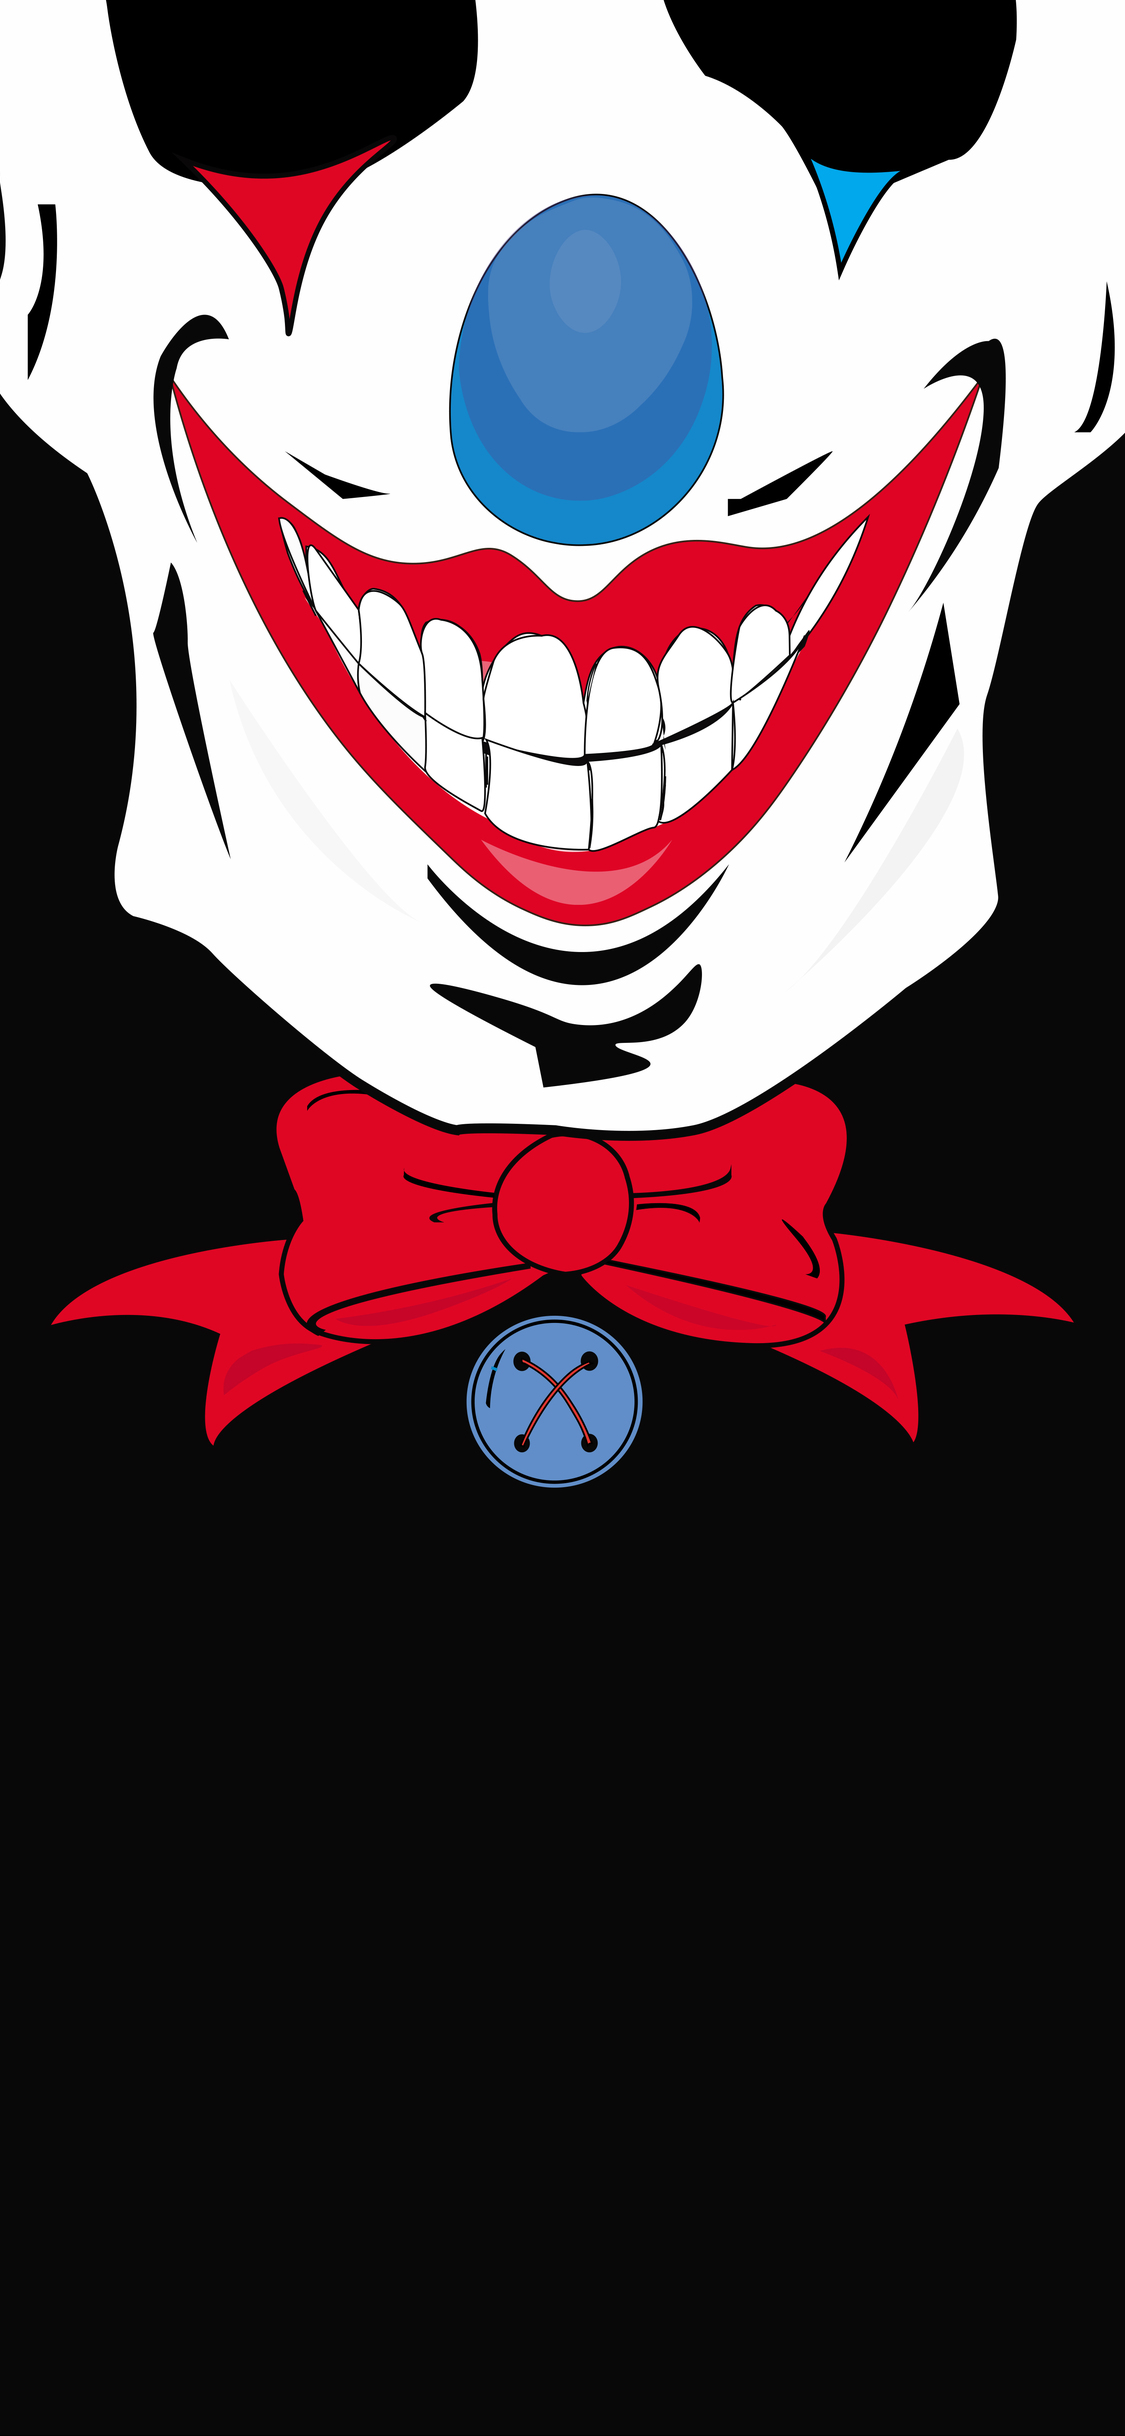 1125x2436 Joker Minimalist Dark Iphone Xs Iphone 10 Iphone X